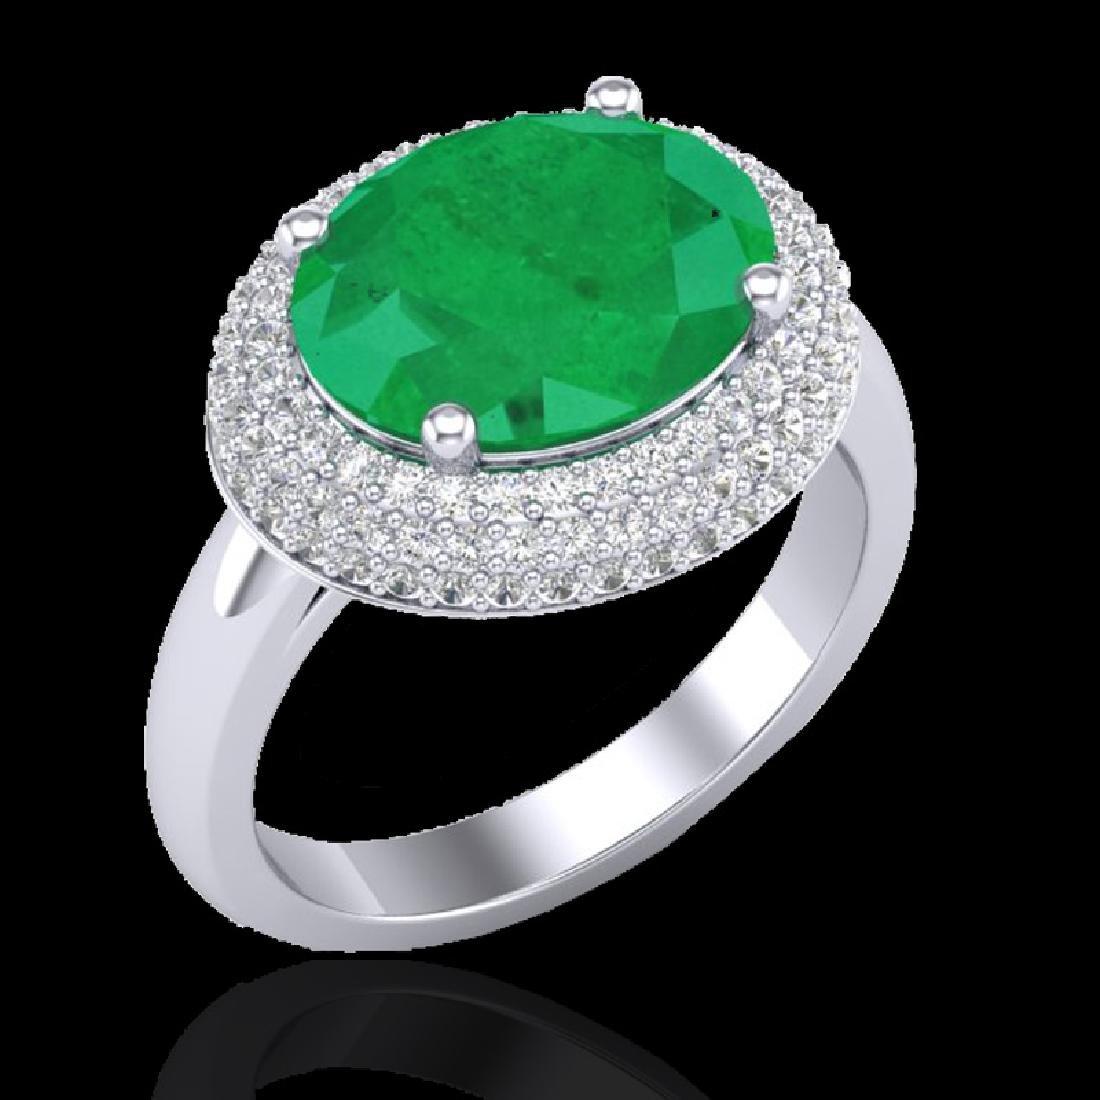 4.50 CTW Emerald & Micro Pave VS/SI Diamond Ring 18K